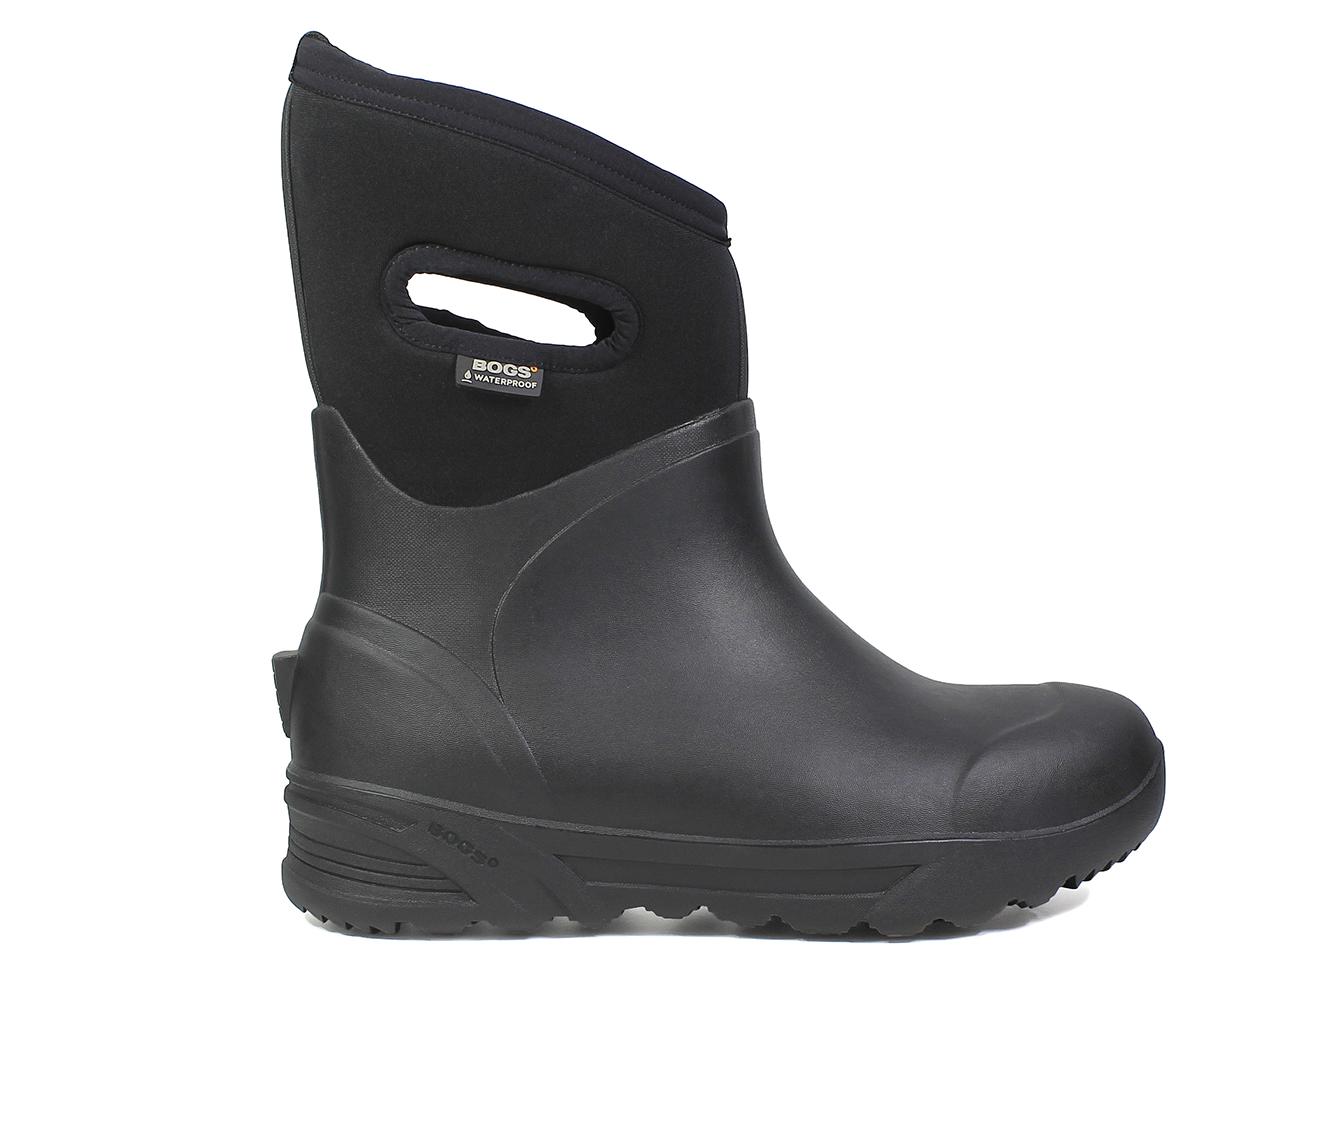 Bogs Footwear Bozeman Mid Insulated Waterproof Boots Men's Boots (Black Fabric)